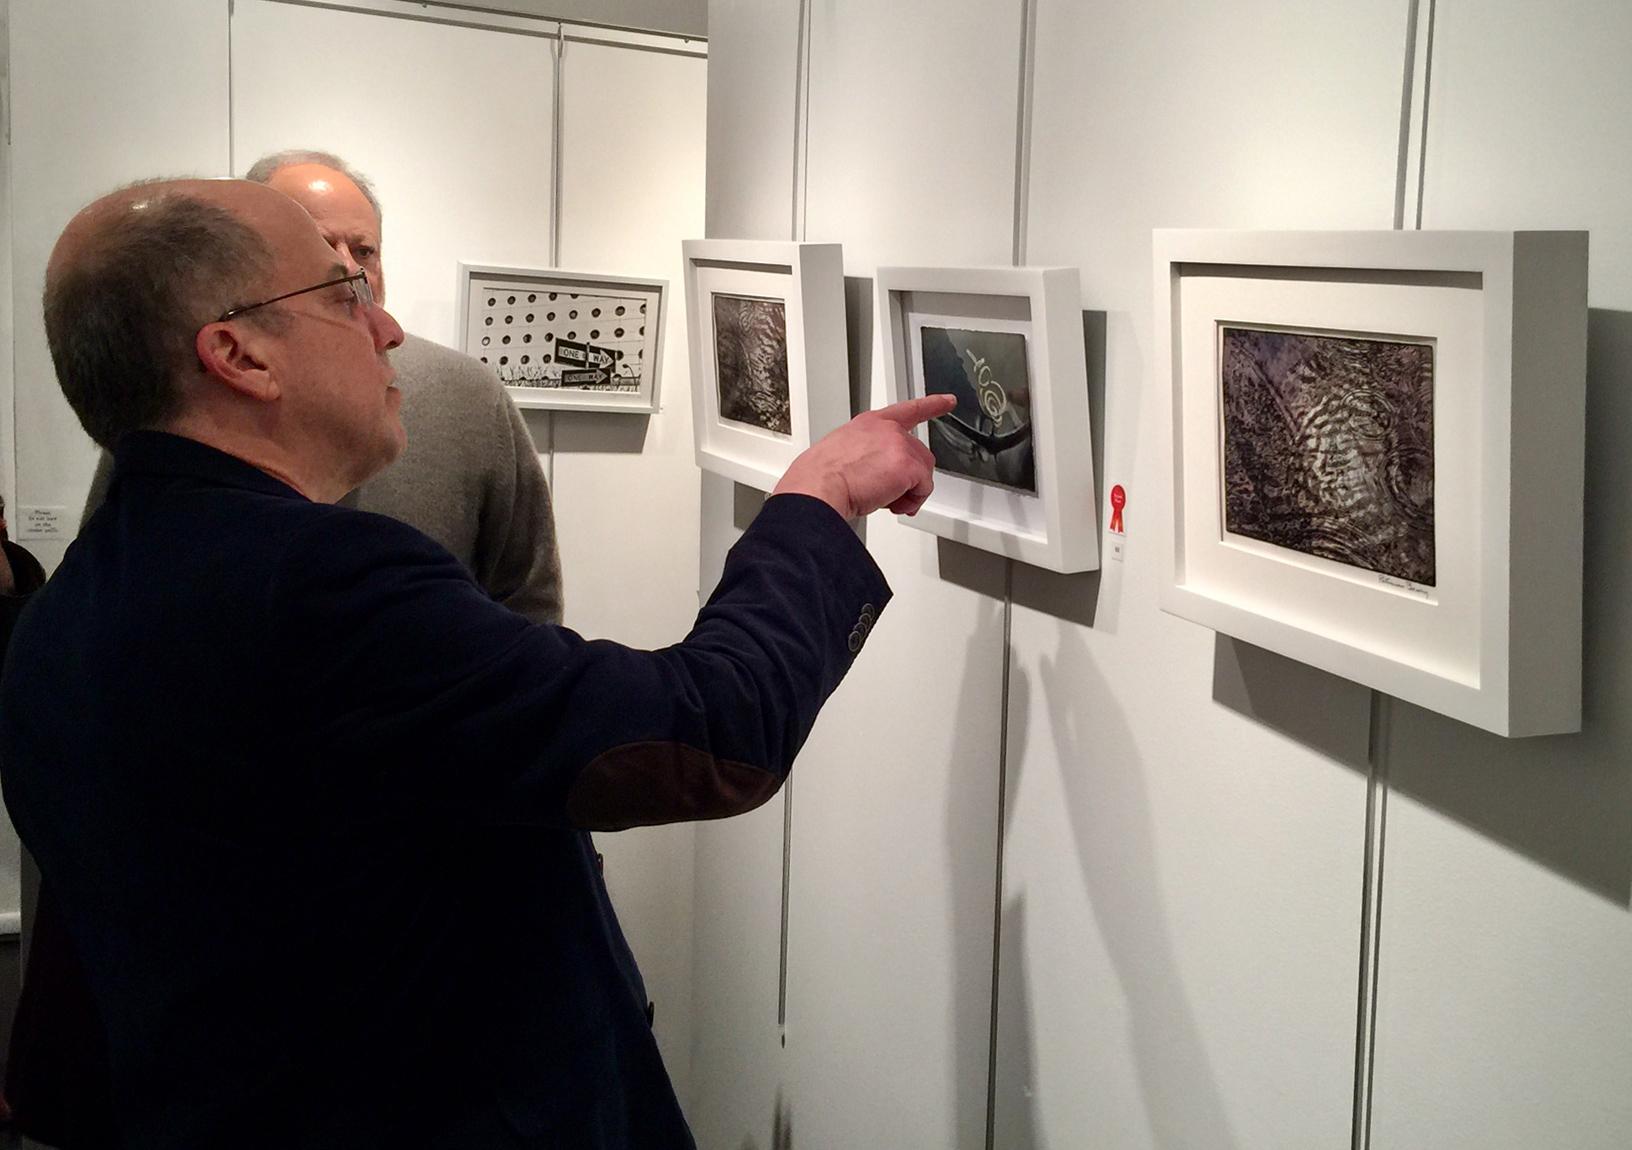 Guest enjoying Lois Youman's work